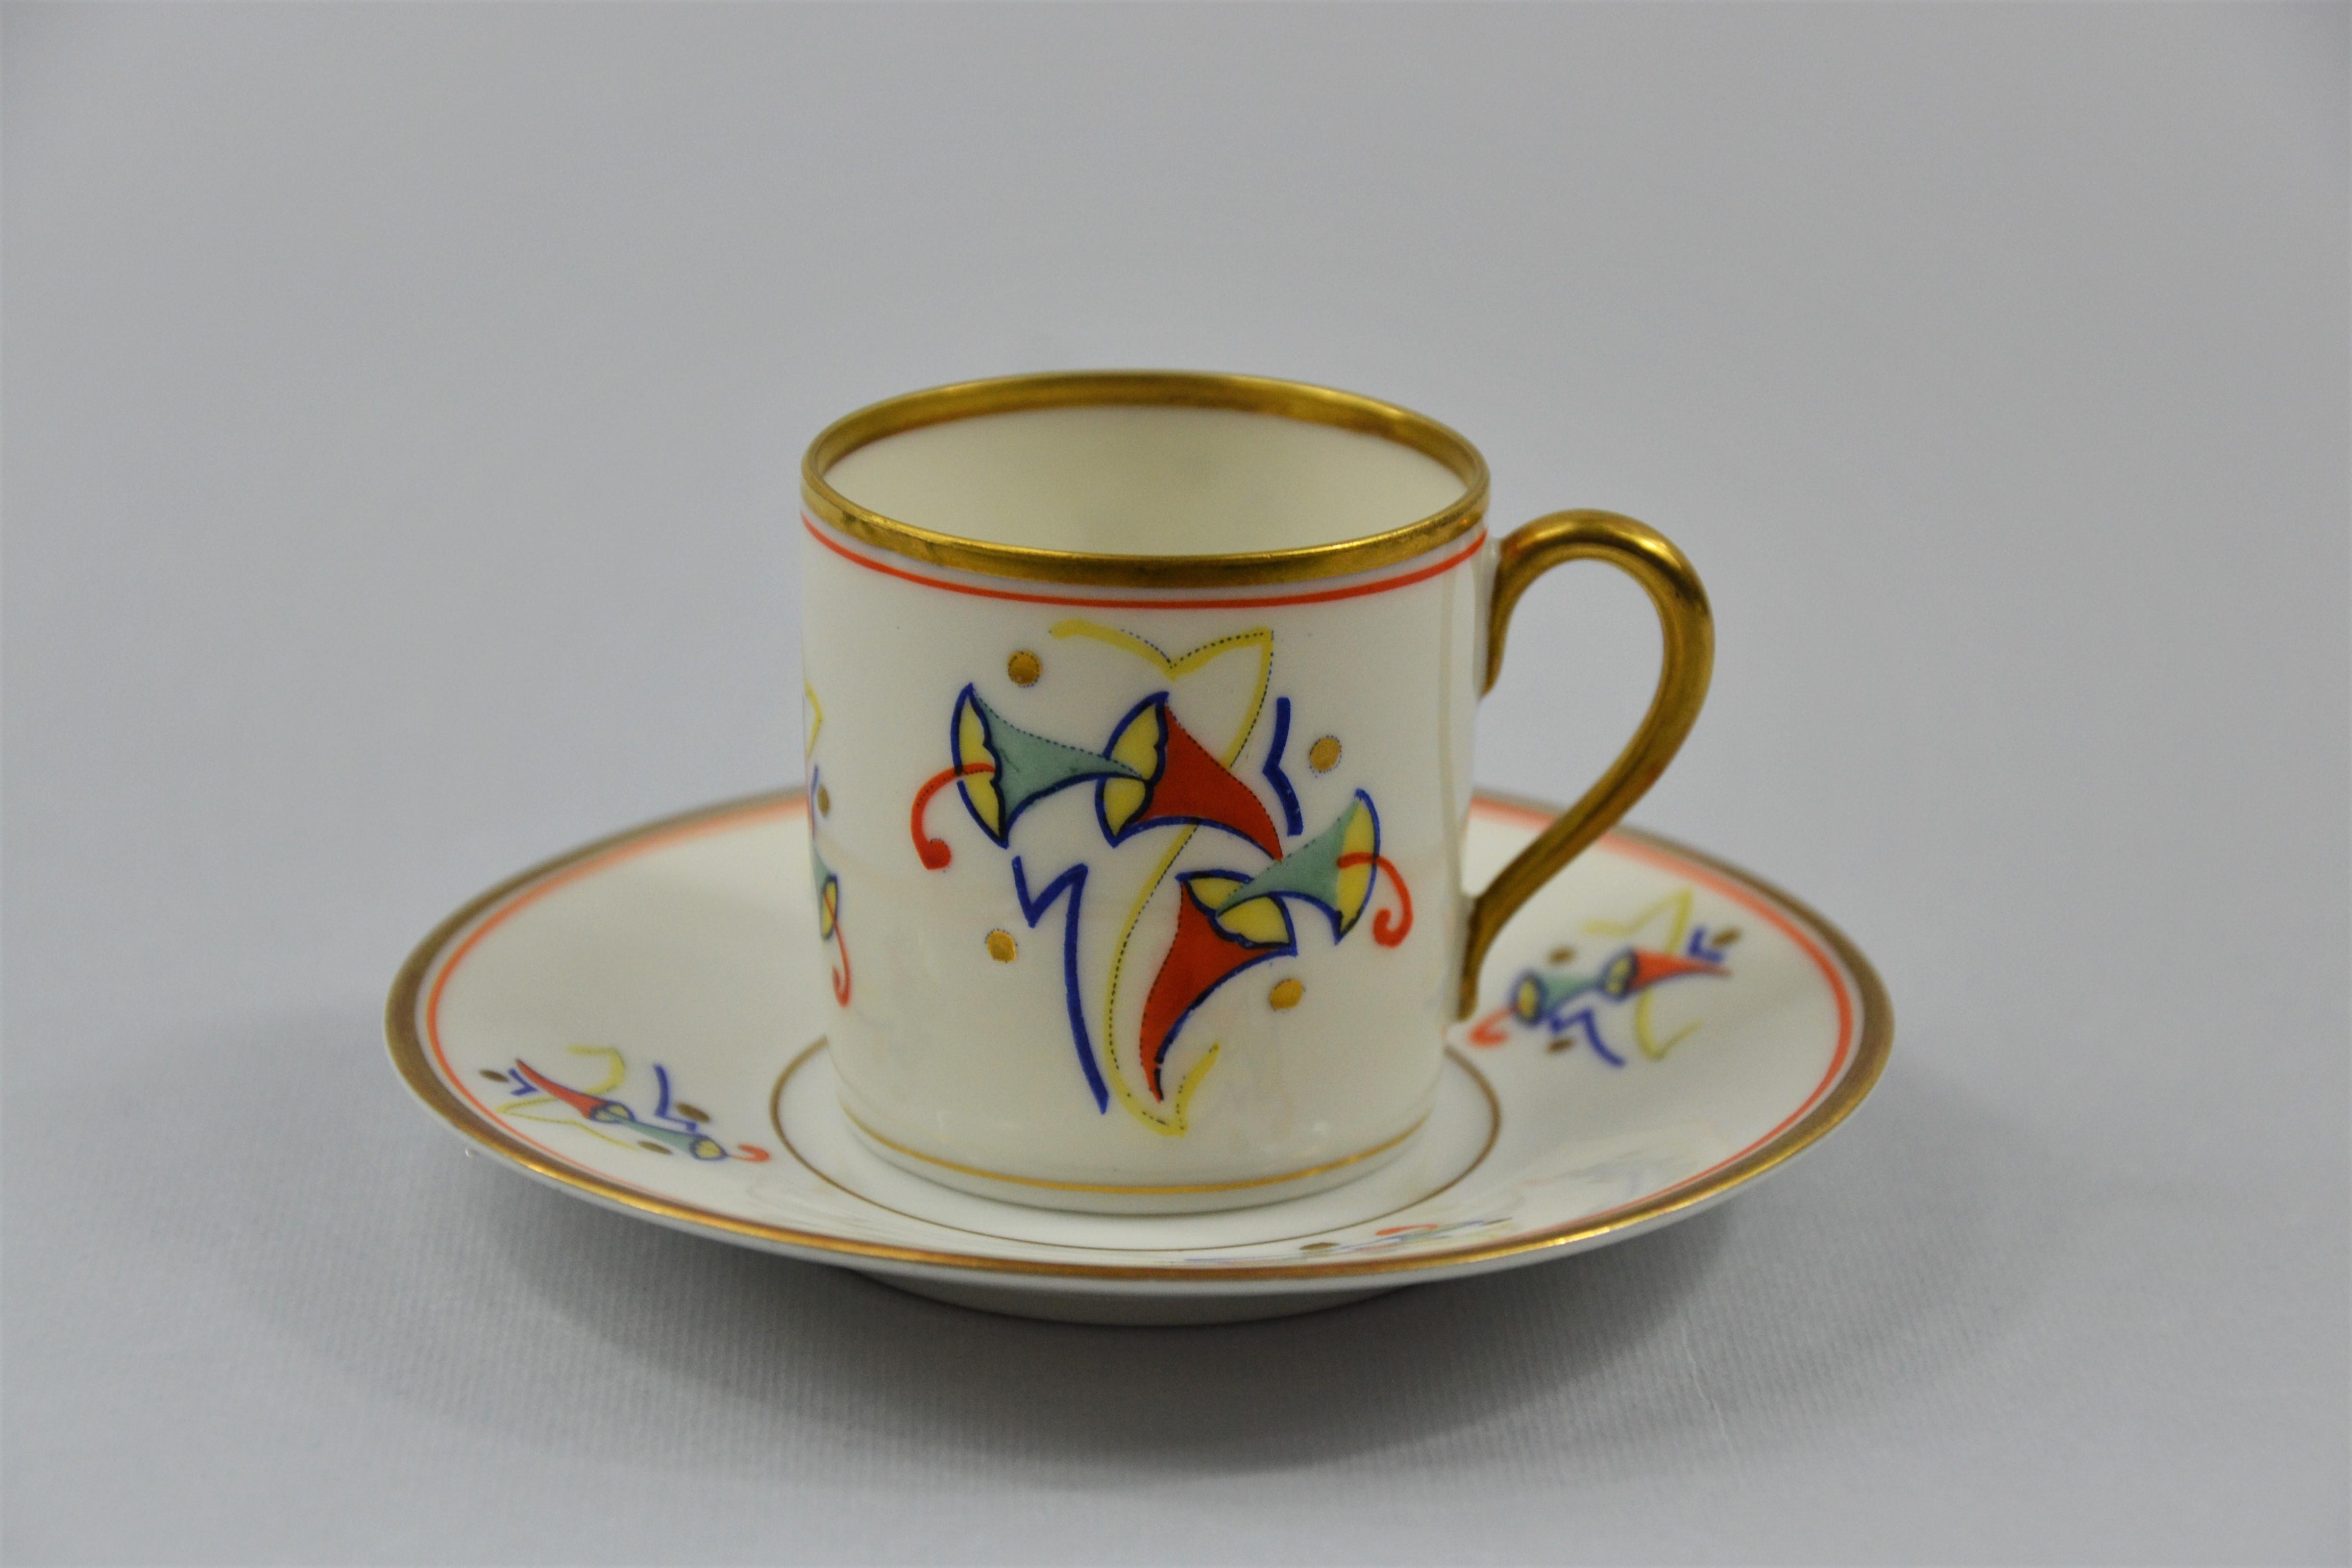 Filiżanka i spodek, Niemcy, 1898-1906 r., Rosenthal Bavaria